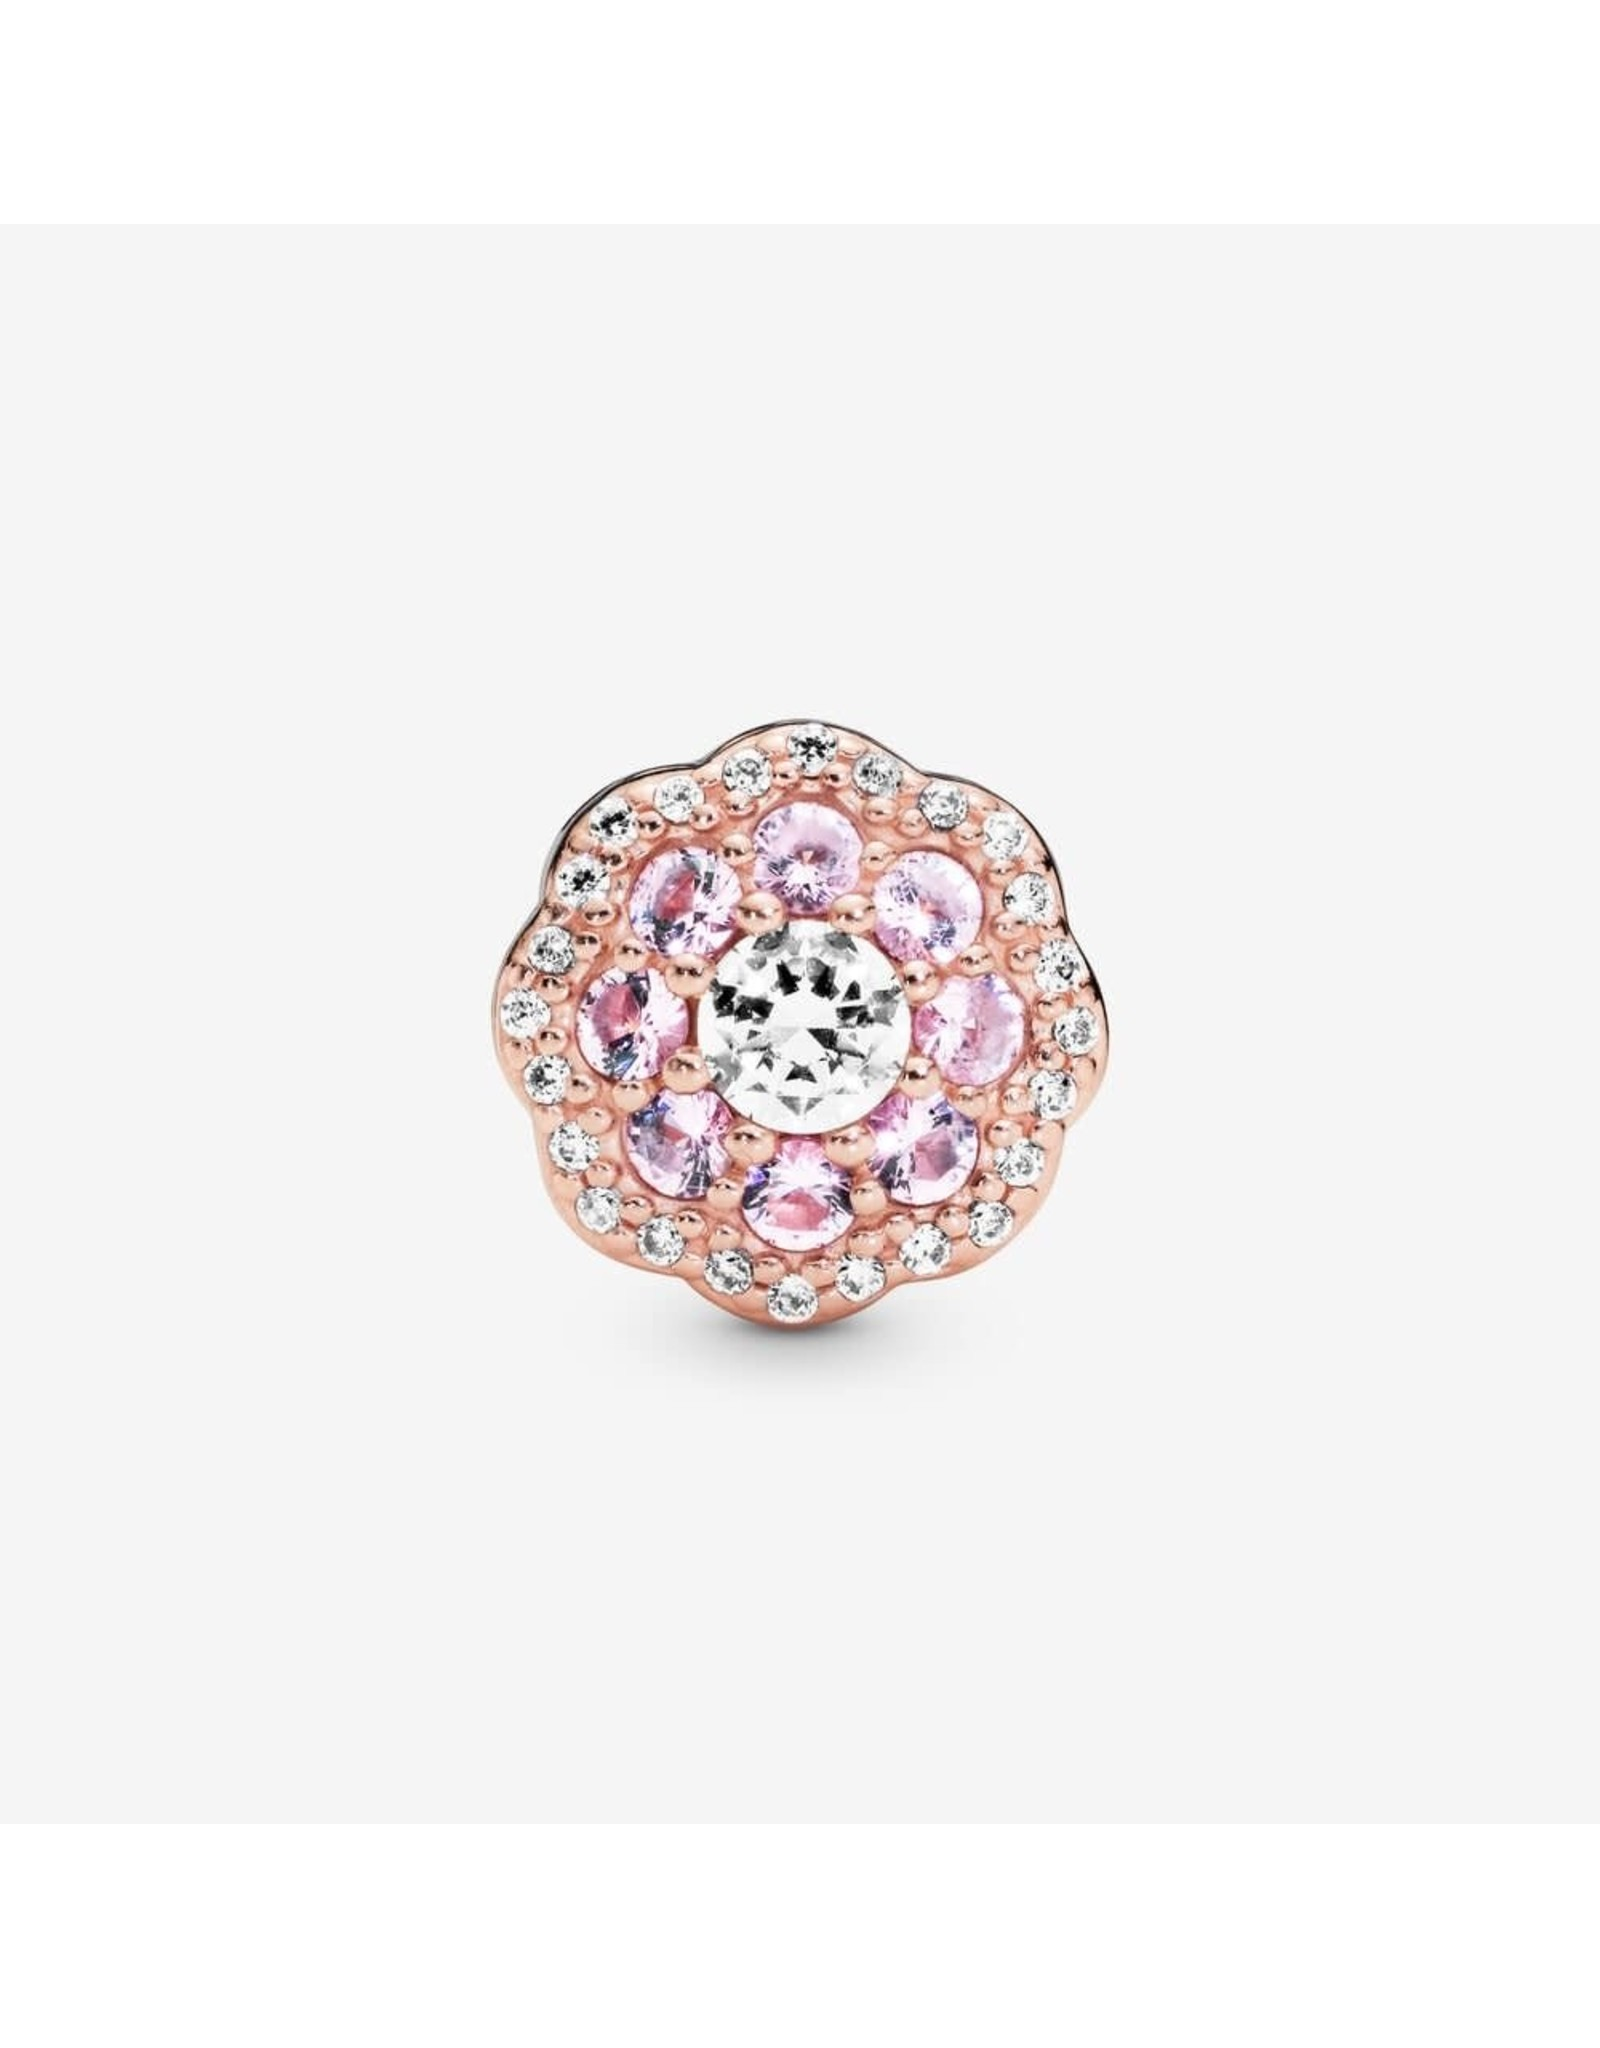 Pandora Pandora Charm Pink Sparkle Flower, Pink Crystals & Clear CZ